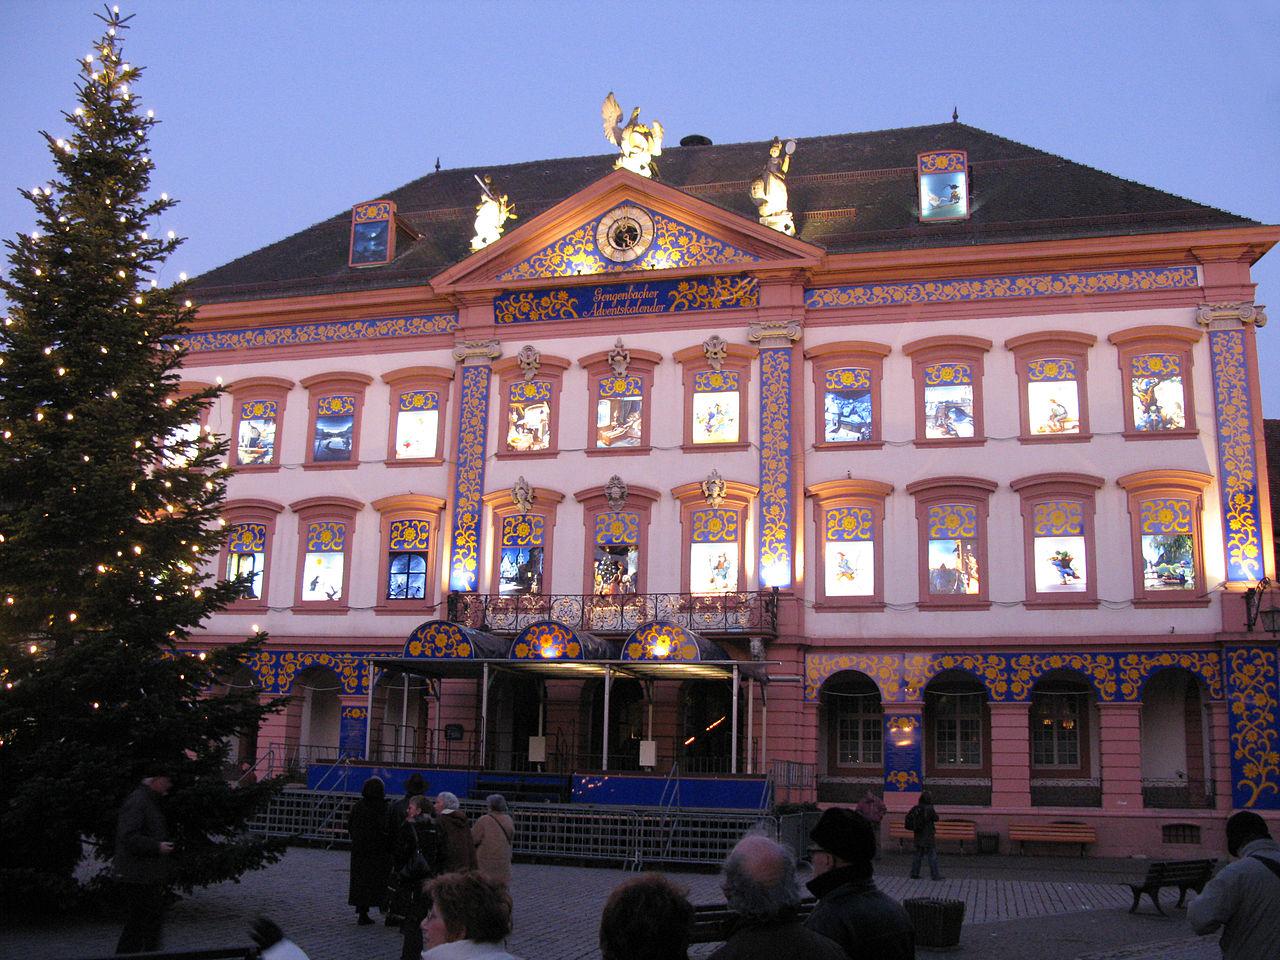 datei:gengenbacher rathaus als adventskalenderhaus – wikipedia